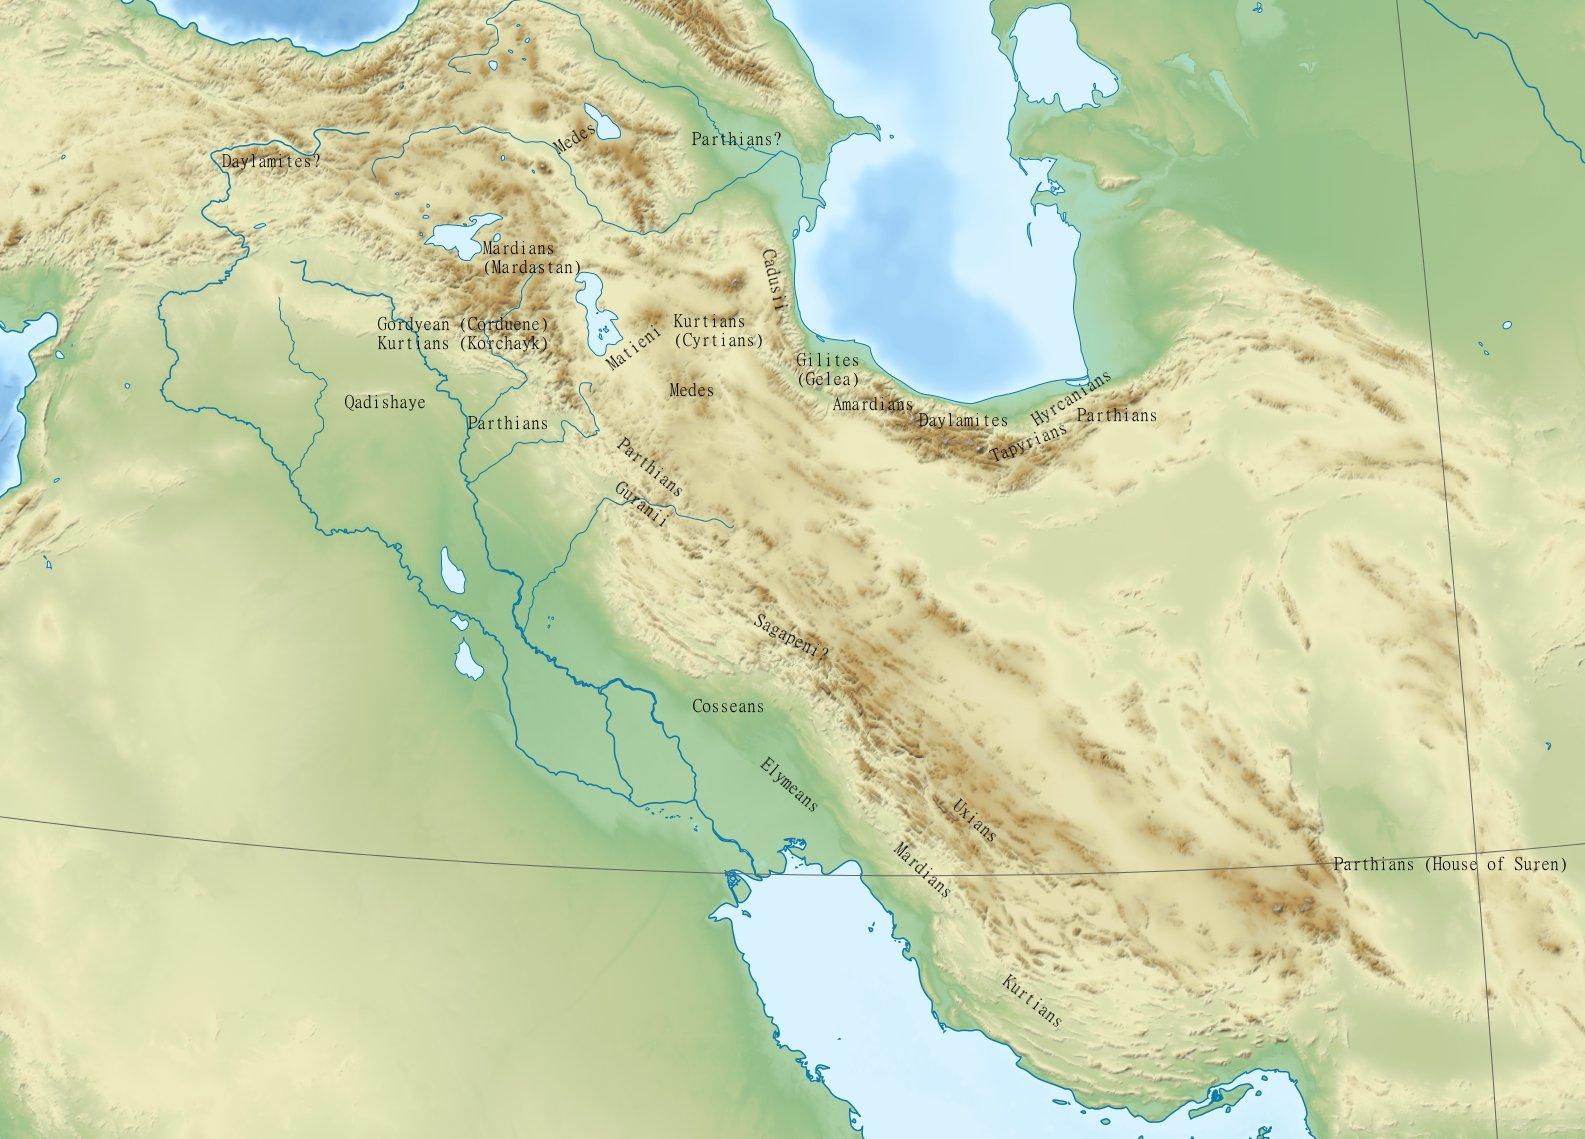 Armenians from ErzinganErzincan and DersimTunceli Sources needed